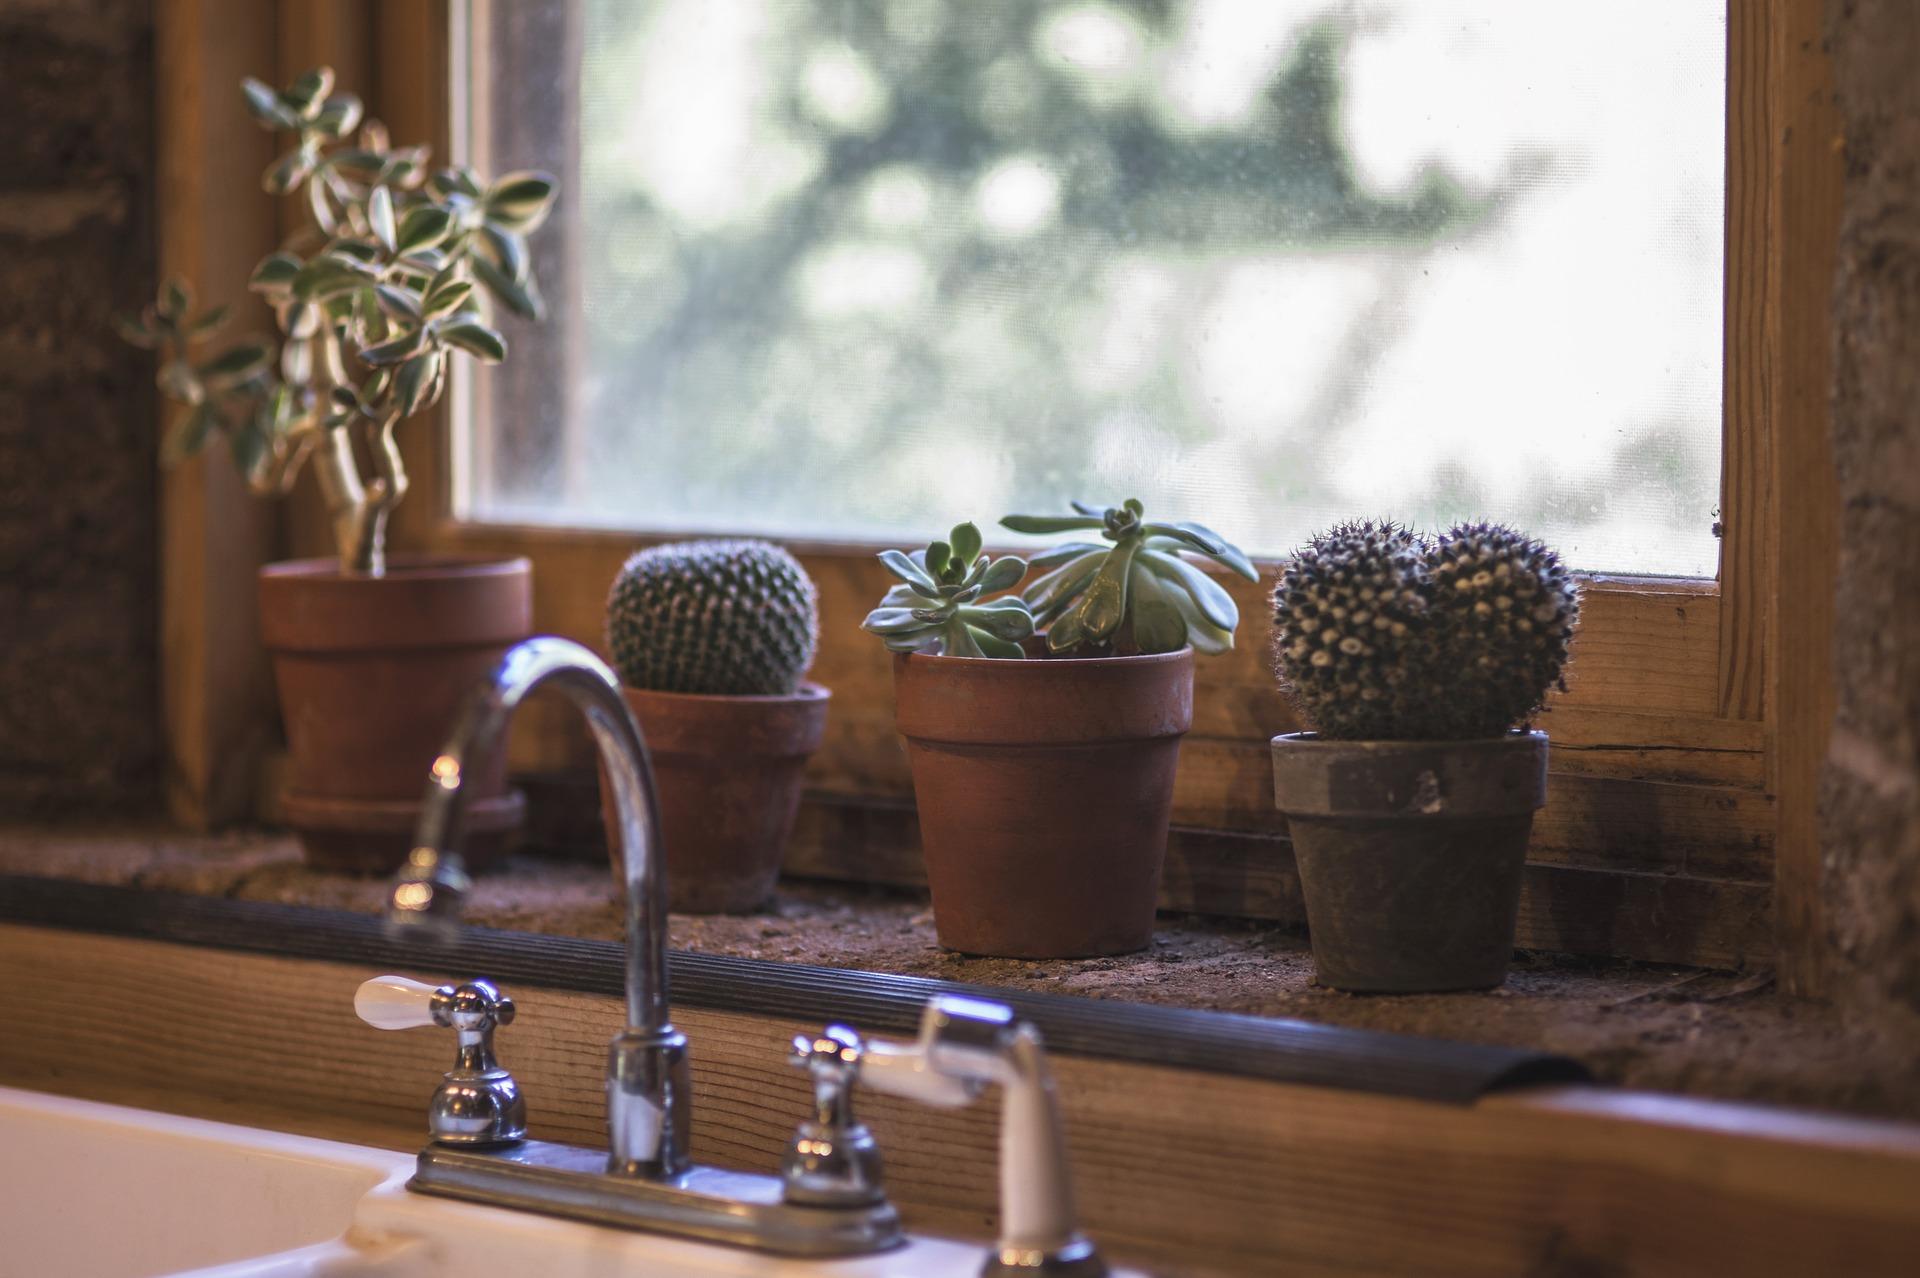 Kaktus sukulent kuchyně